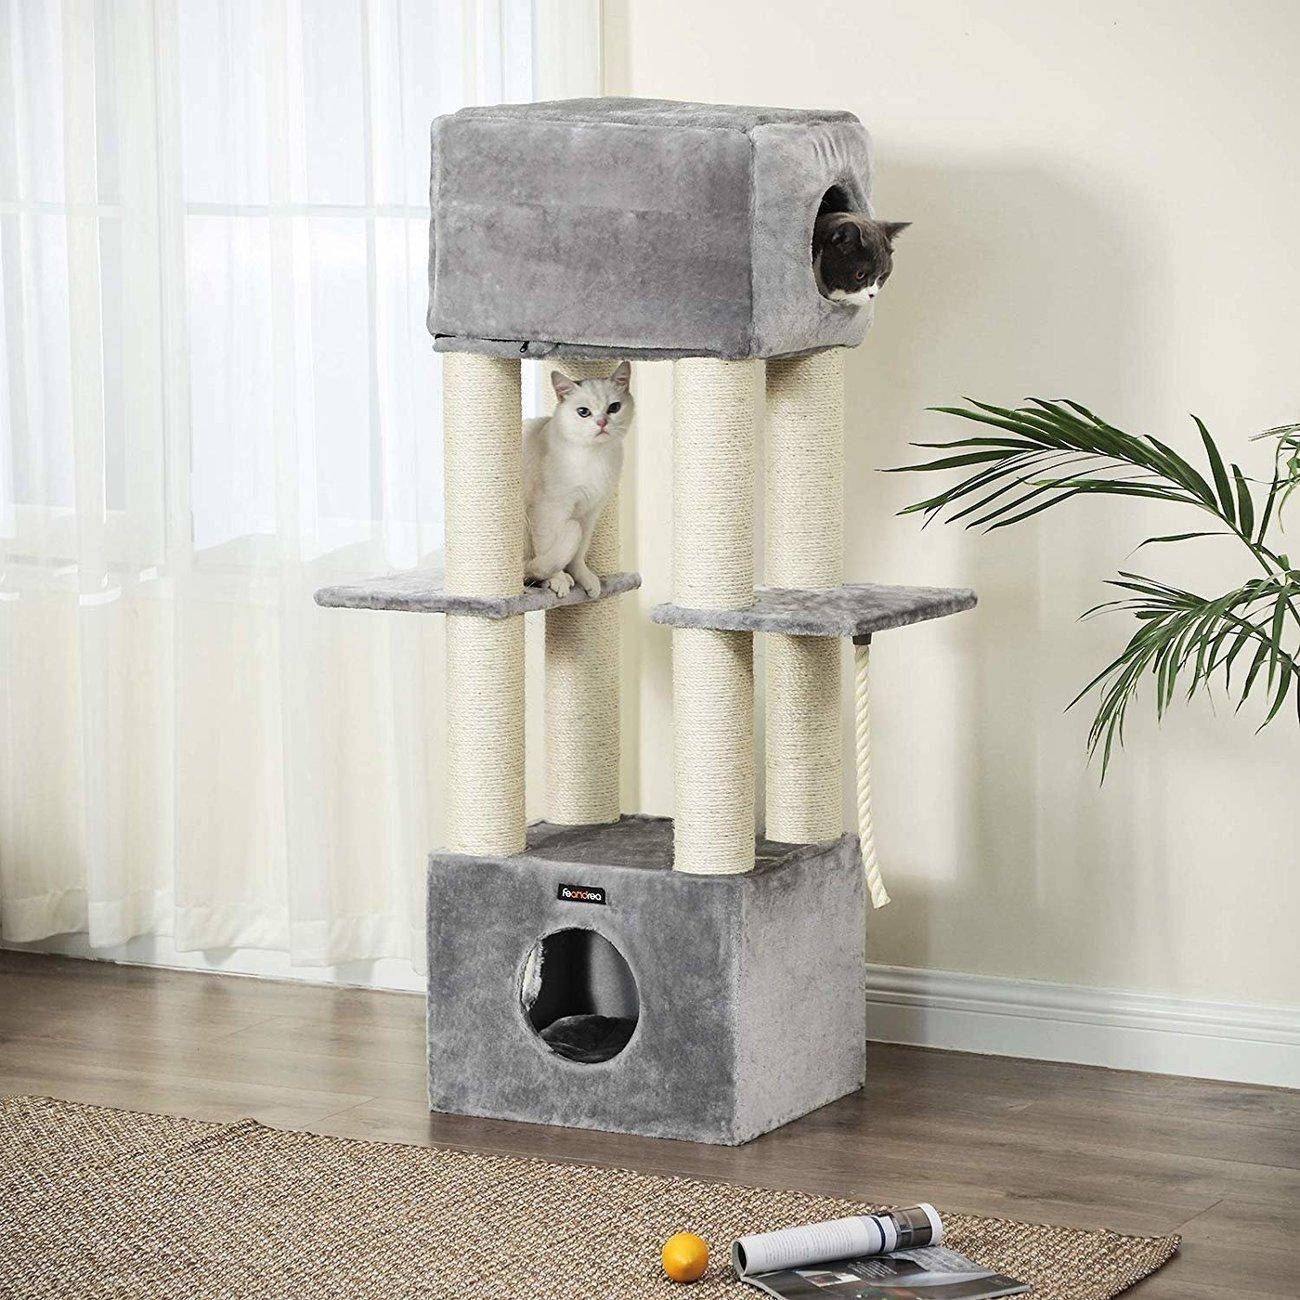 FEANDREA Katzen Kratzbaum mit Aussichtsplattform, Bild 3